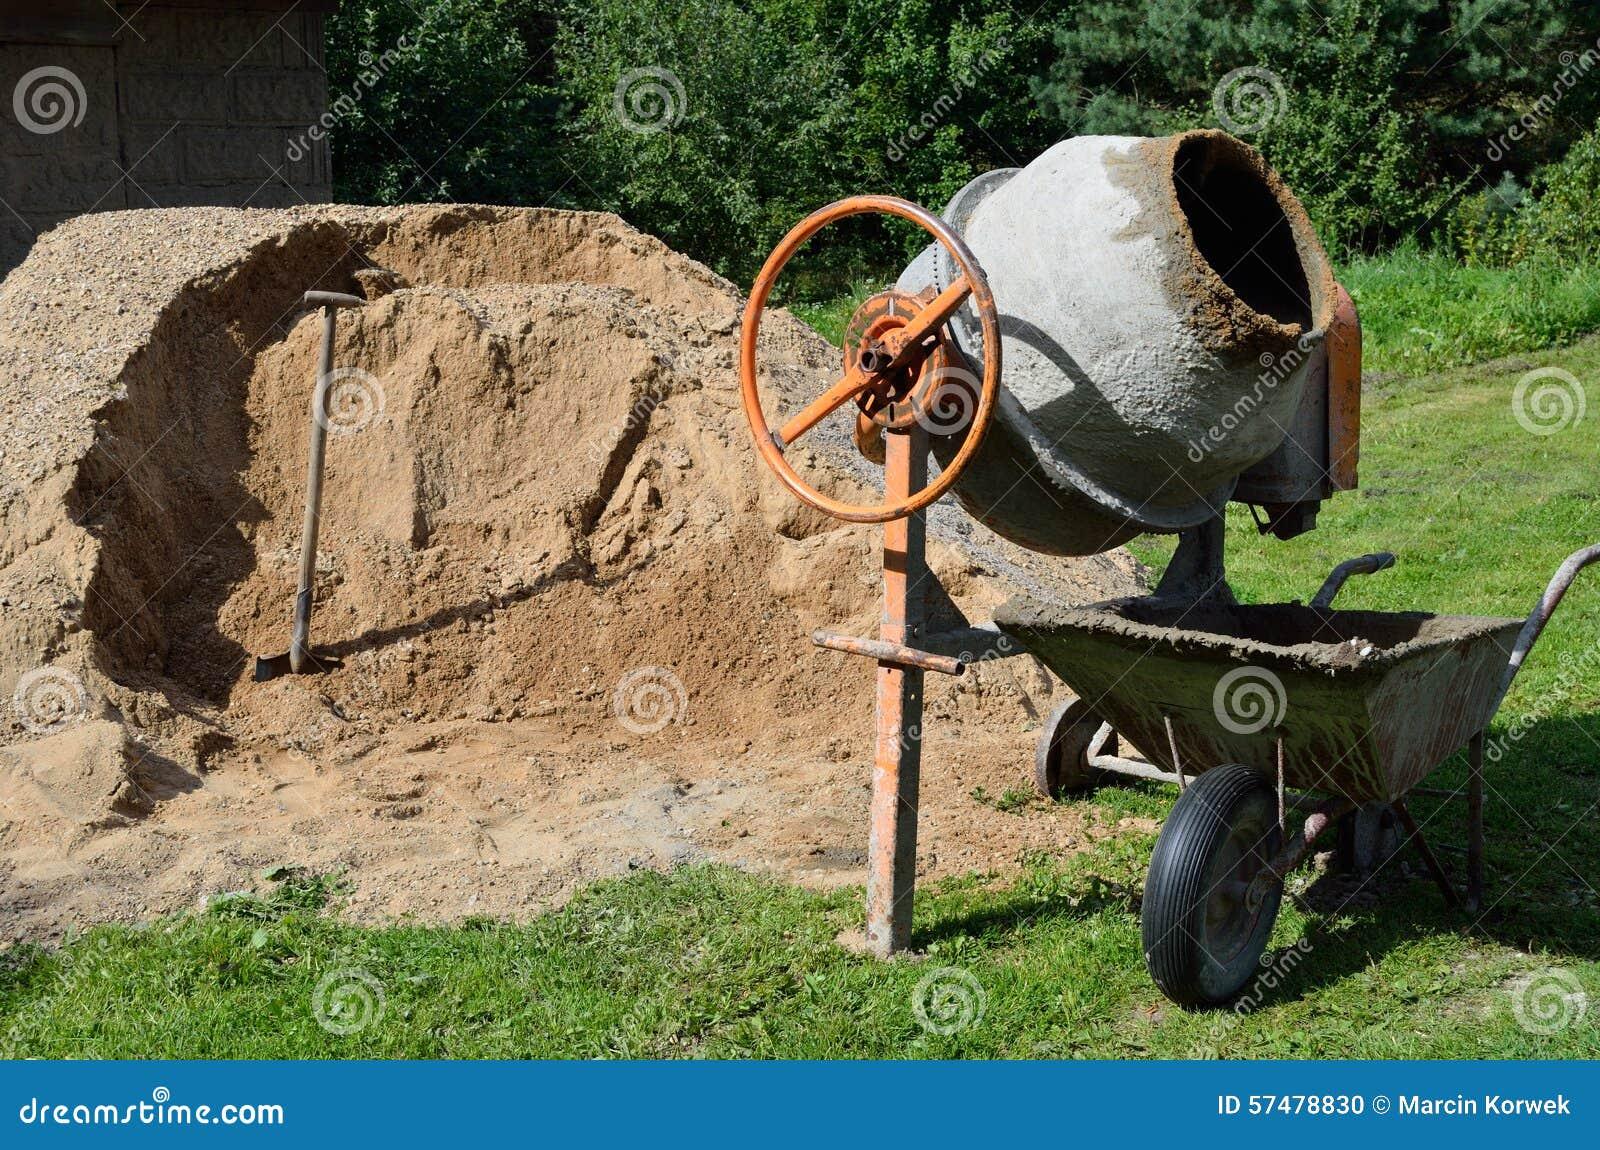 Concrete Mixing Animation : Cement mixer stock photo image